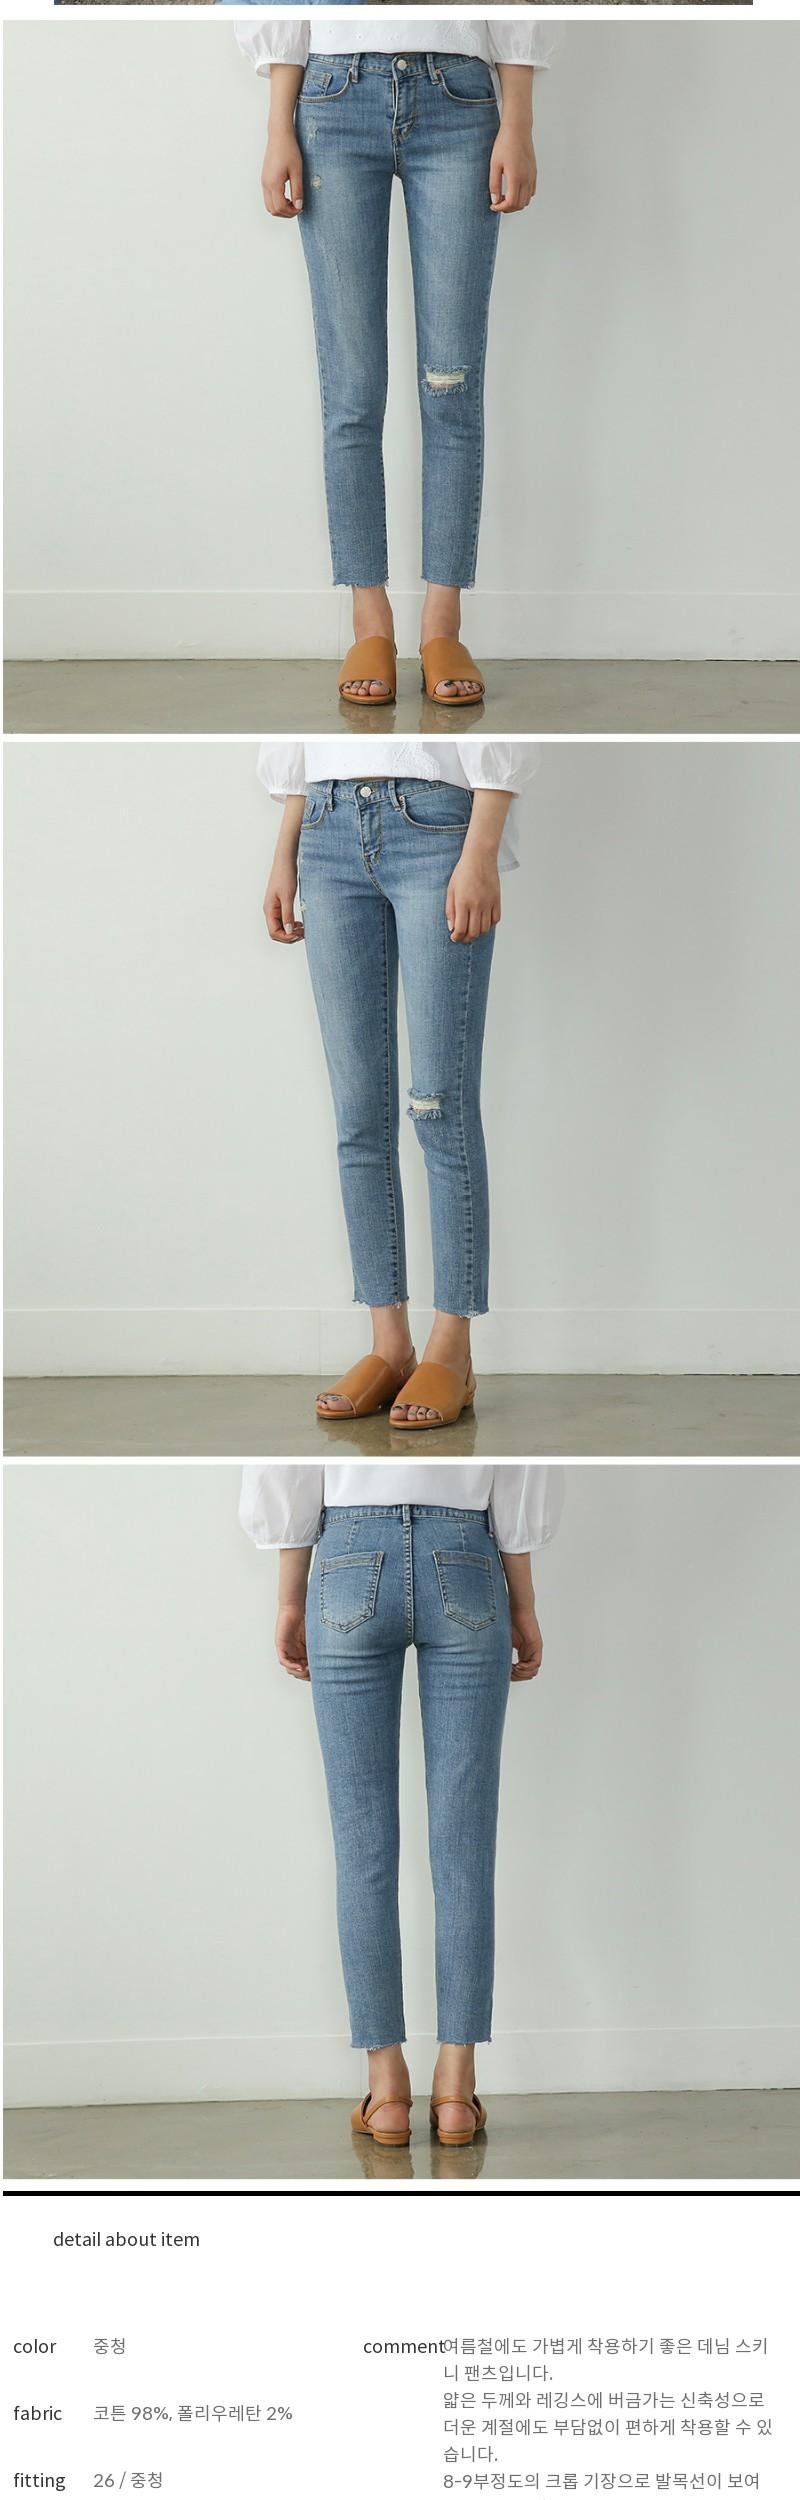 span fine thin skinny